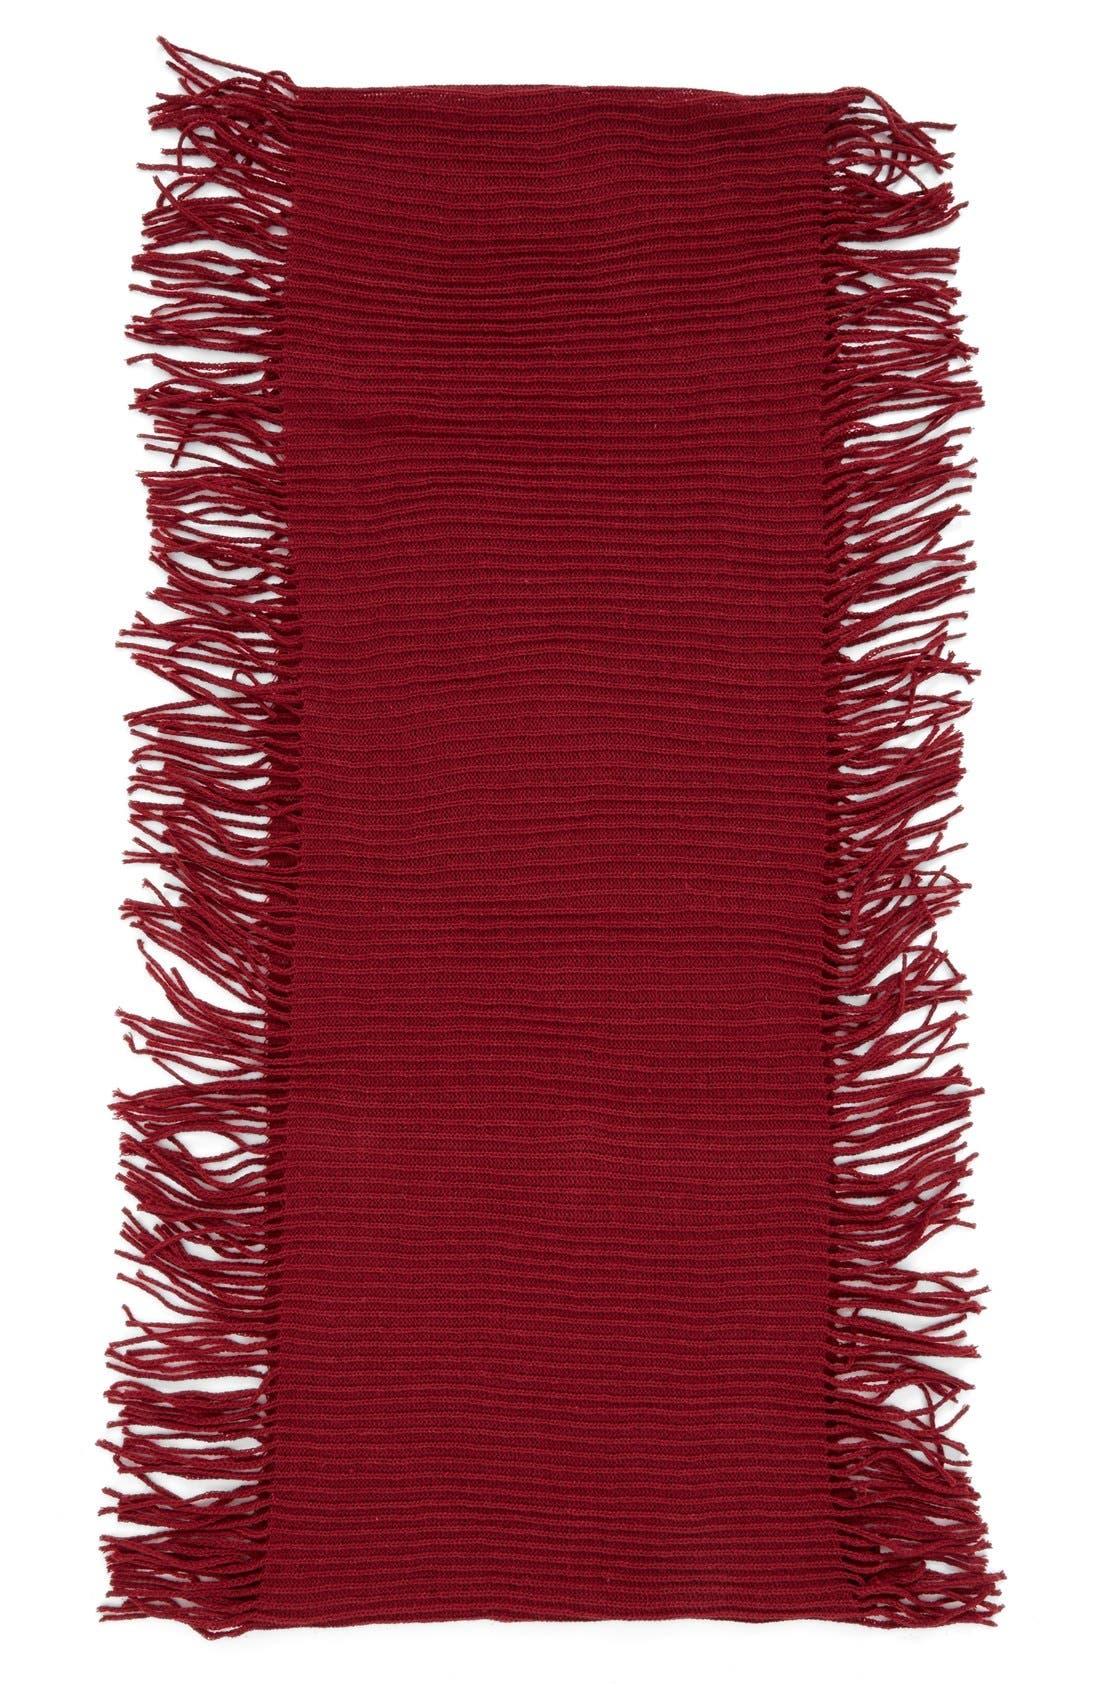 Rib Knit Fringe Infinity Scarf,                             Alternate thumbnail 18, color,